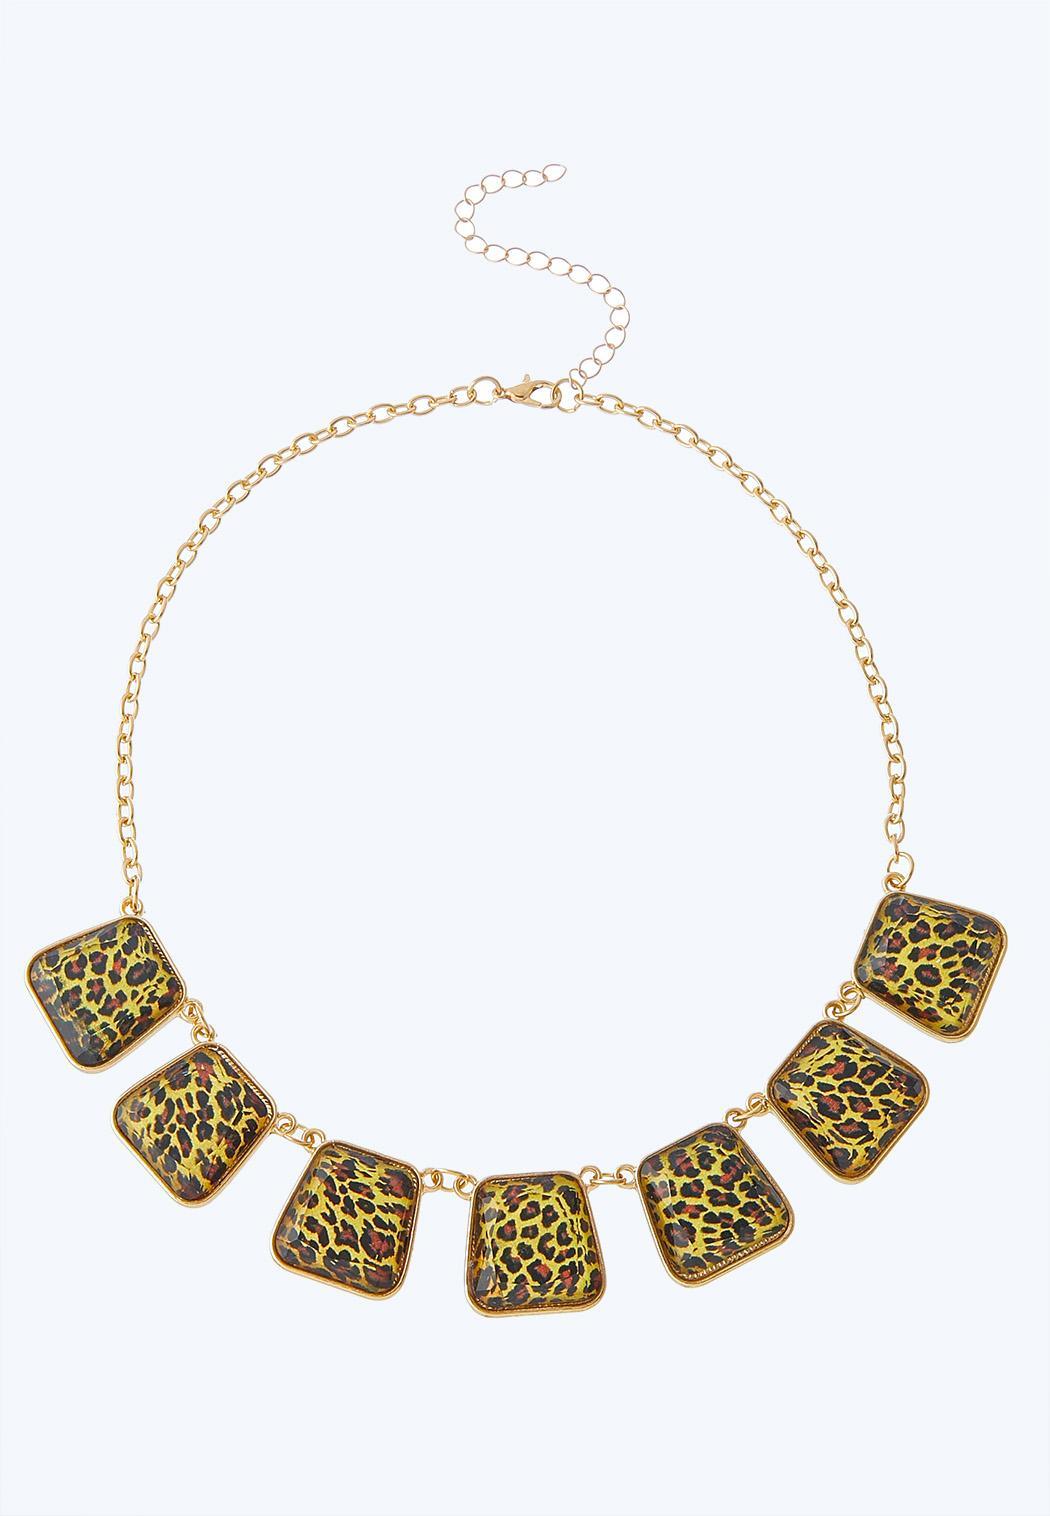 Leopard Stone Bib Necklace